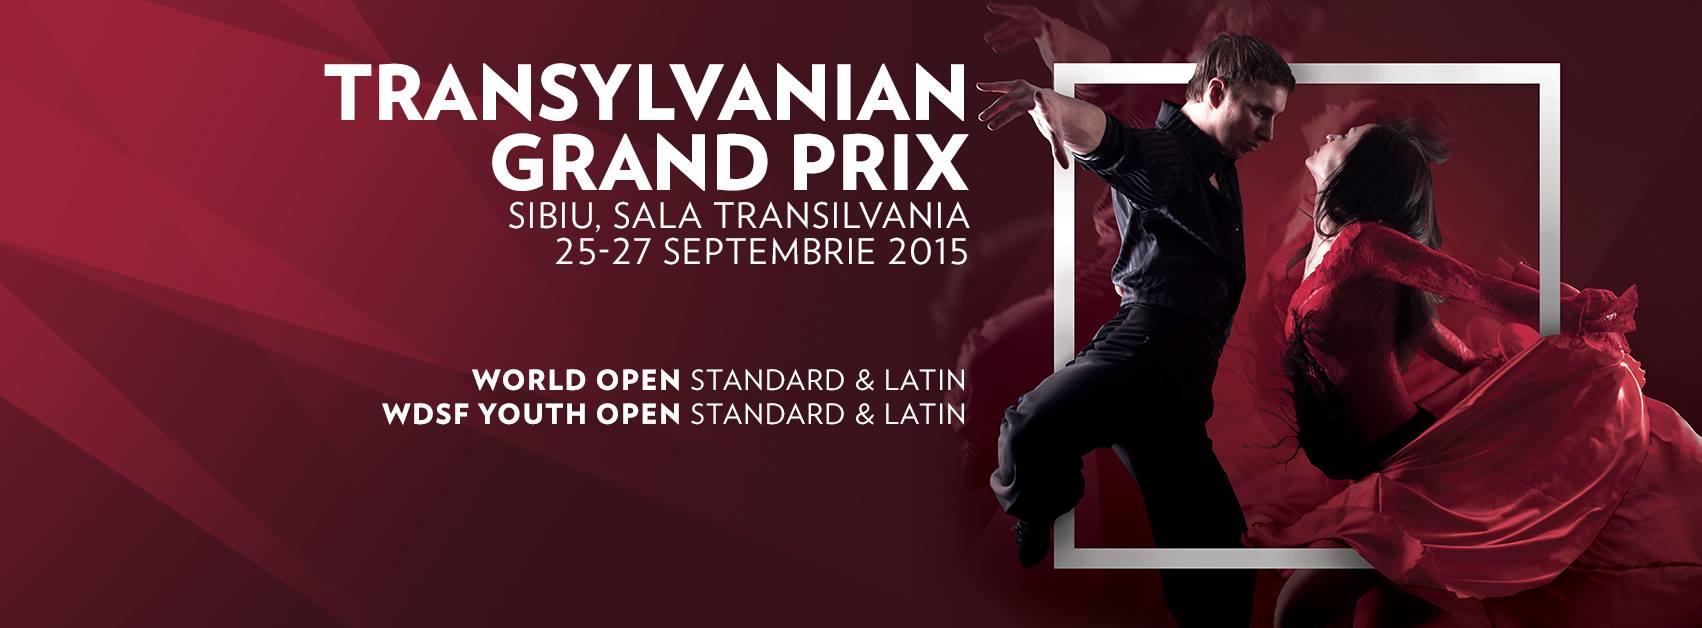 Transylvanian Grand Prix 2015